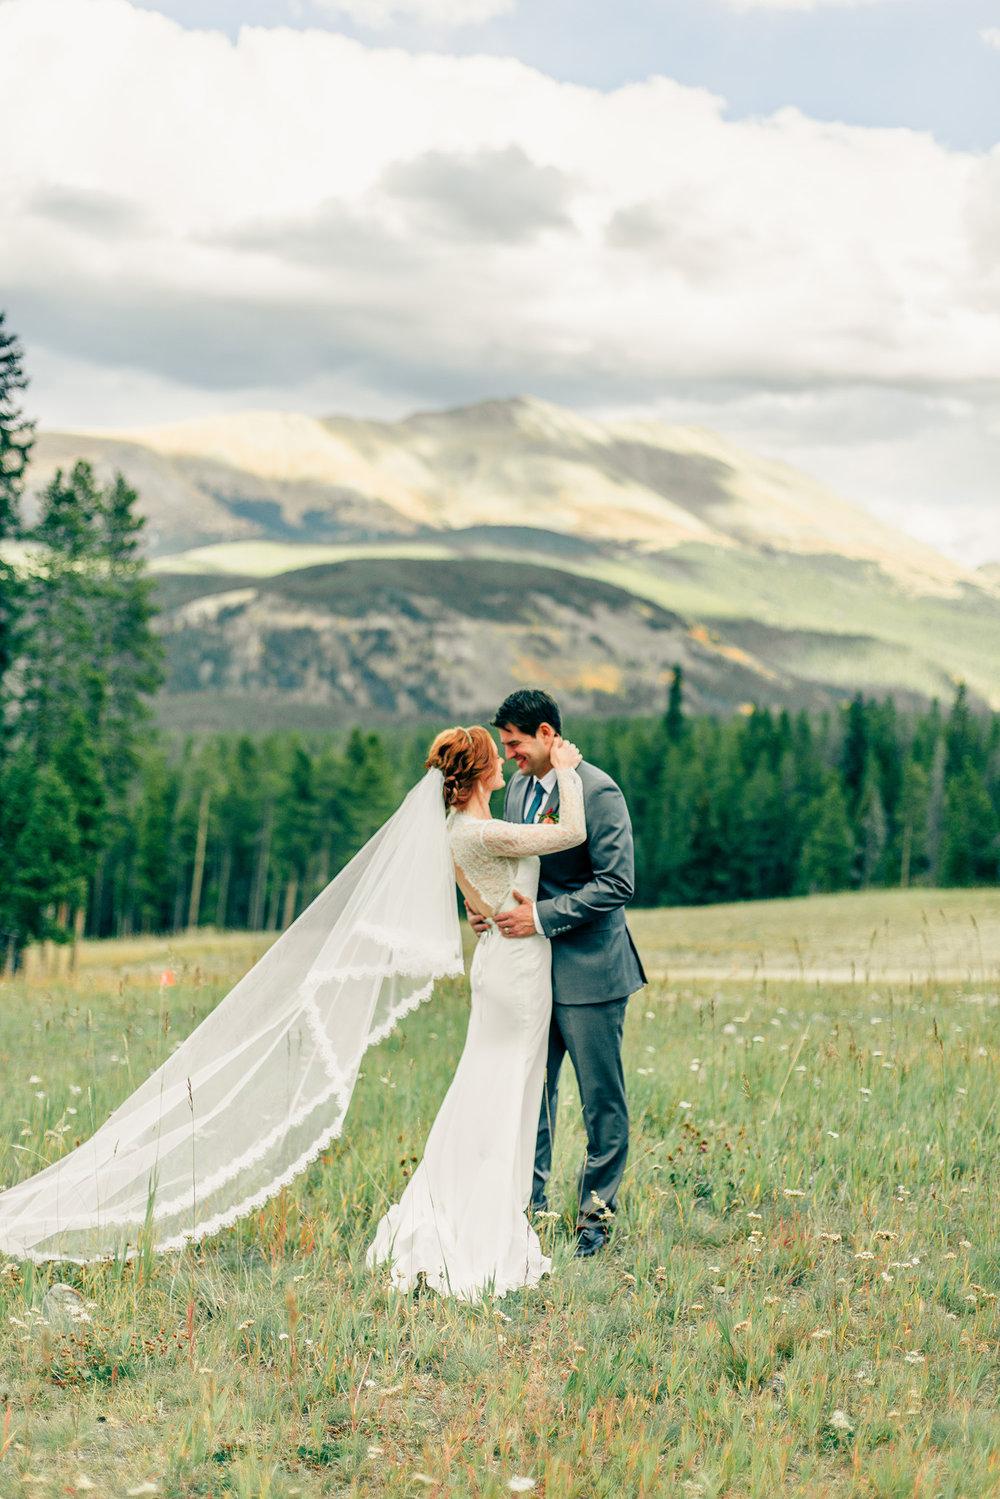 Breckenridge-Ten-Mile-Station-Mountain-Wedding-26.jpg